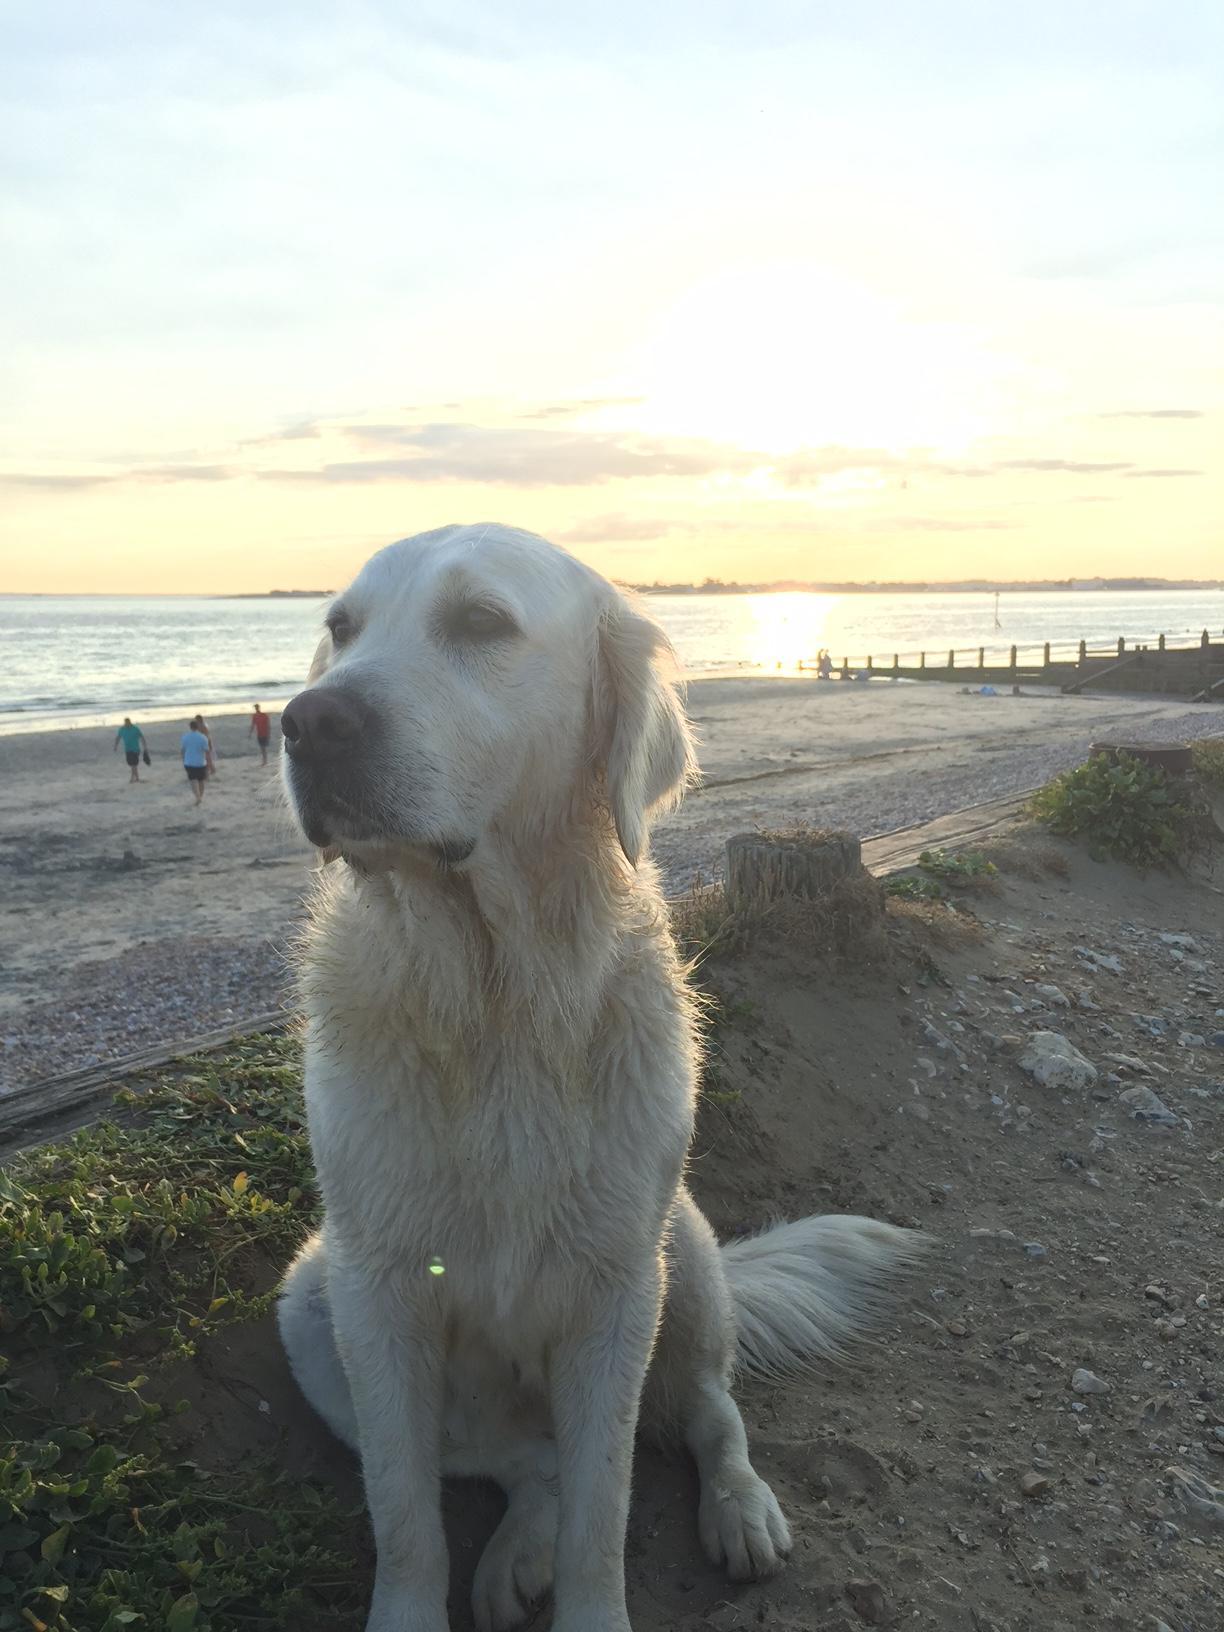 A Golden retriever on the beach in Surrey